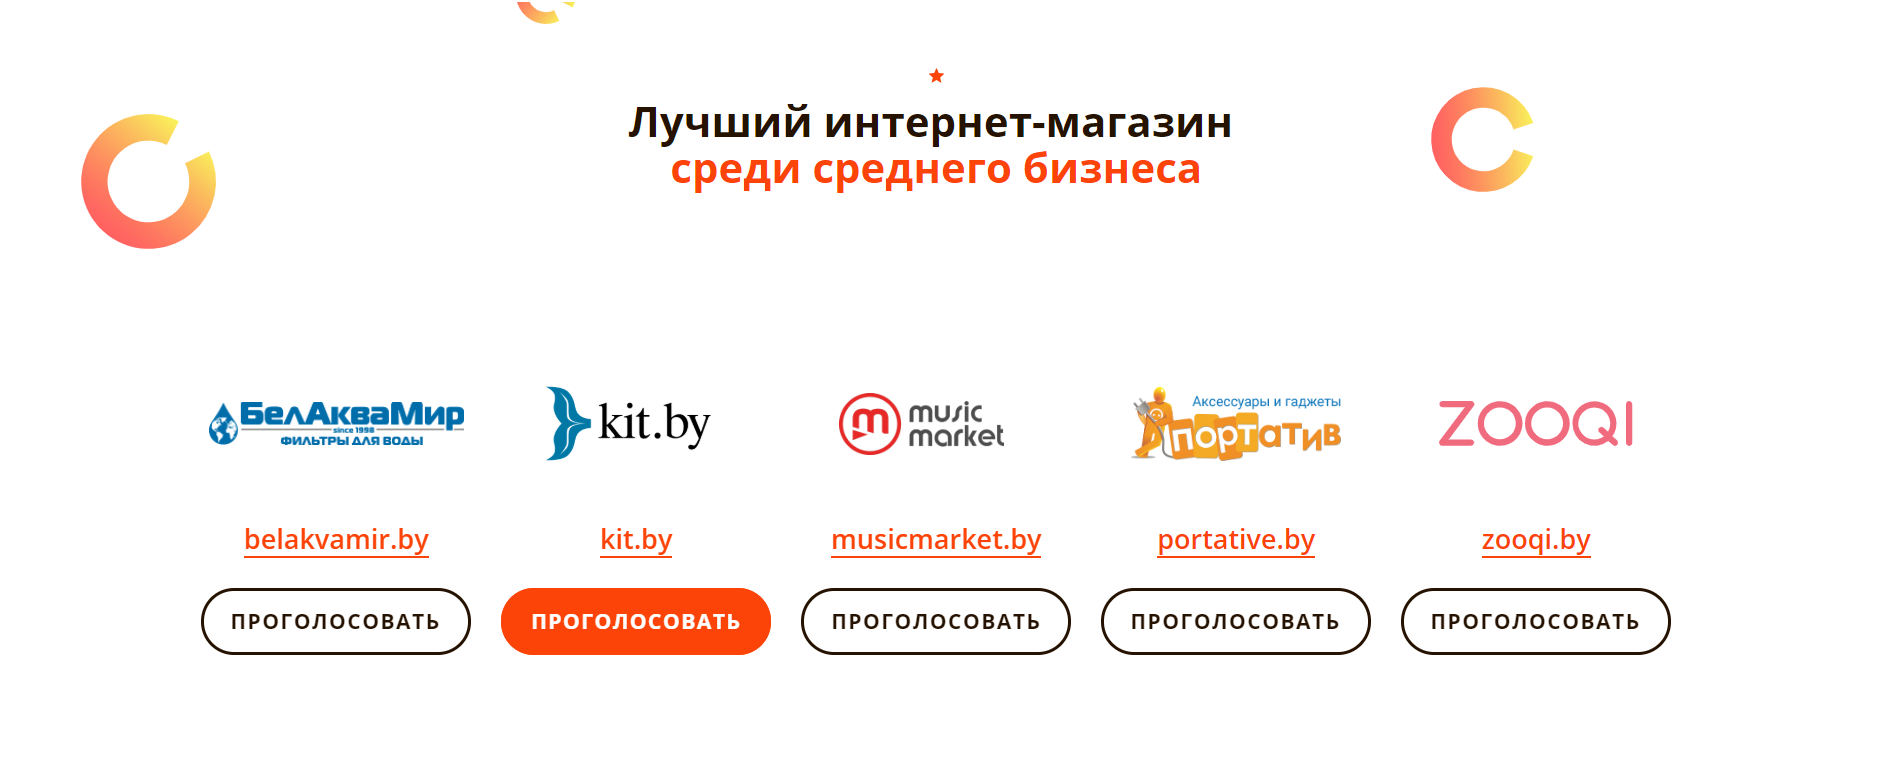 a1e50ae8a6981 kit.by - номинант на премию Лучший интернет-магазин. Нужна Ваша поддержка!